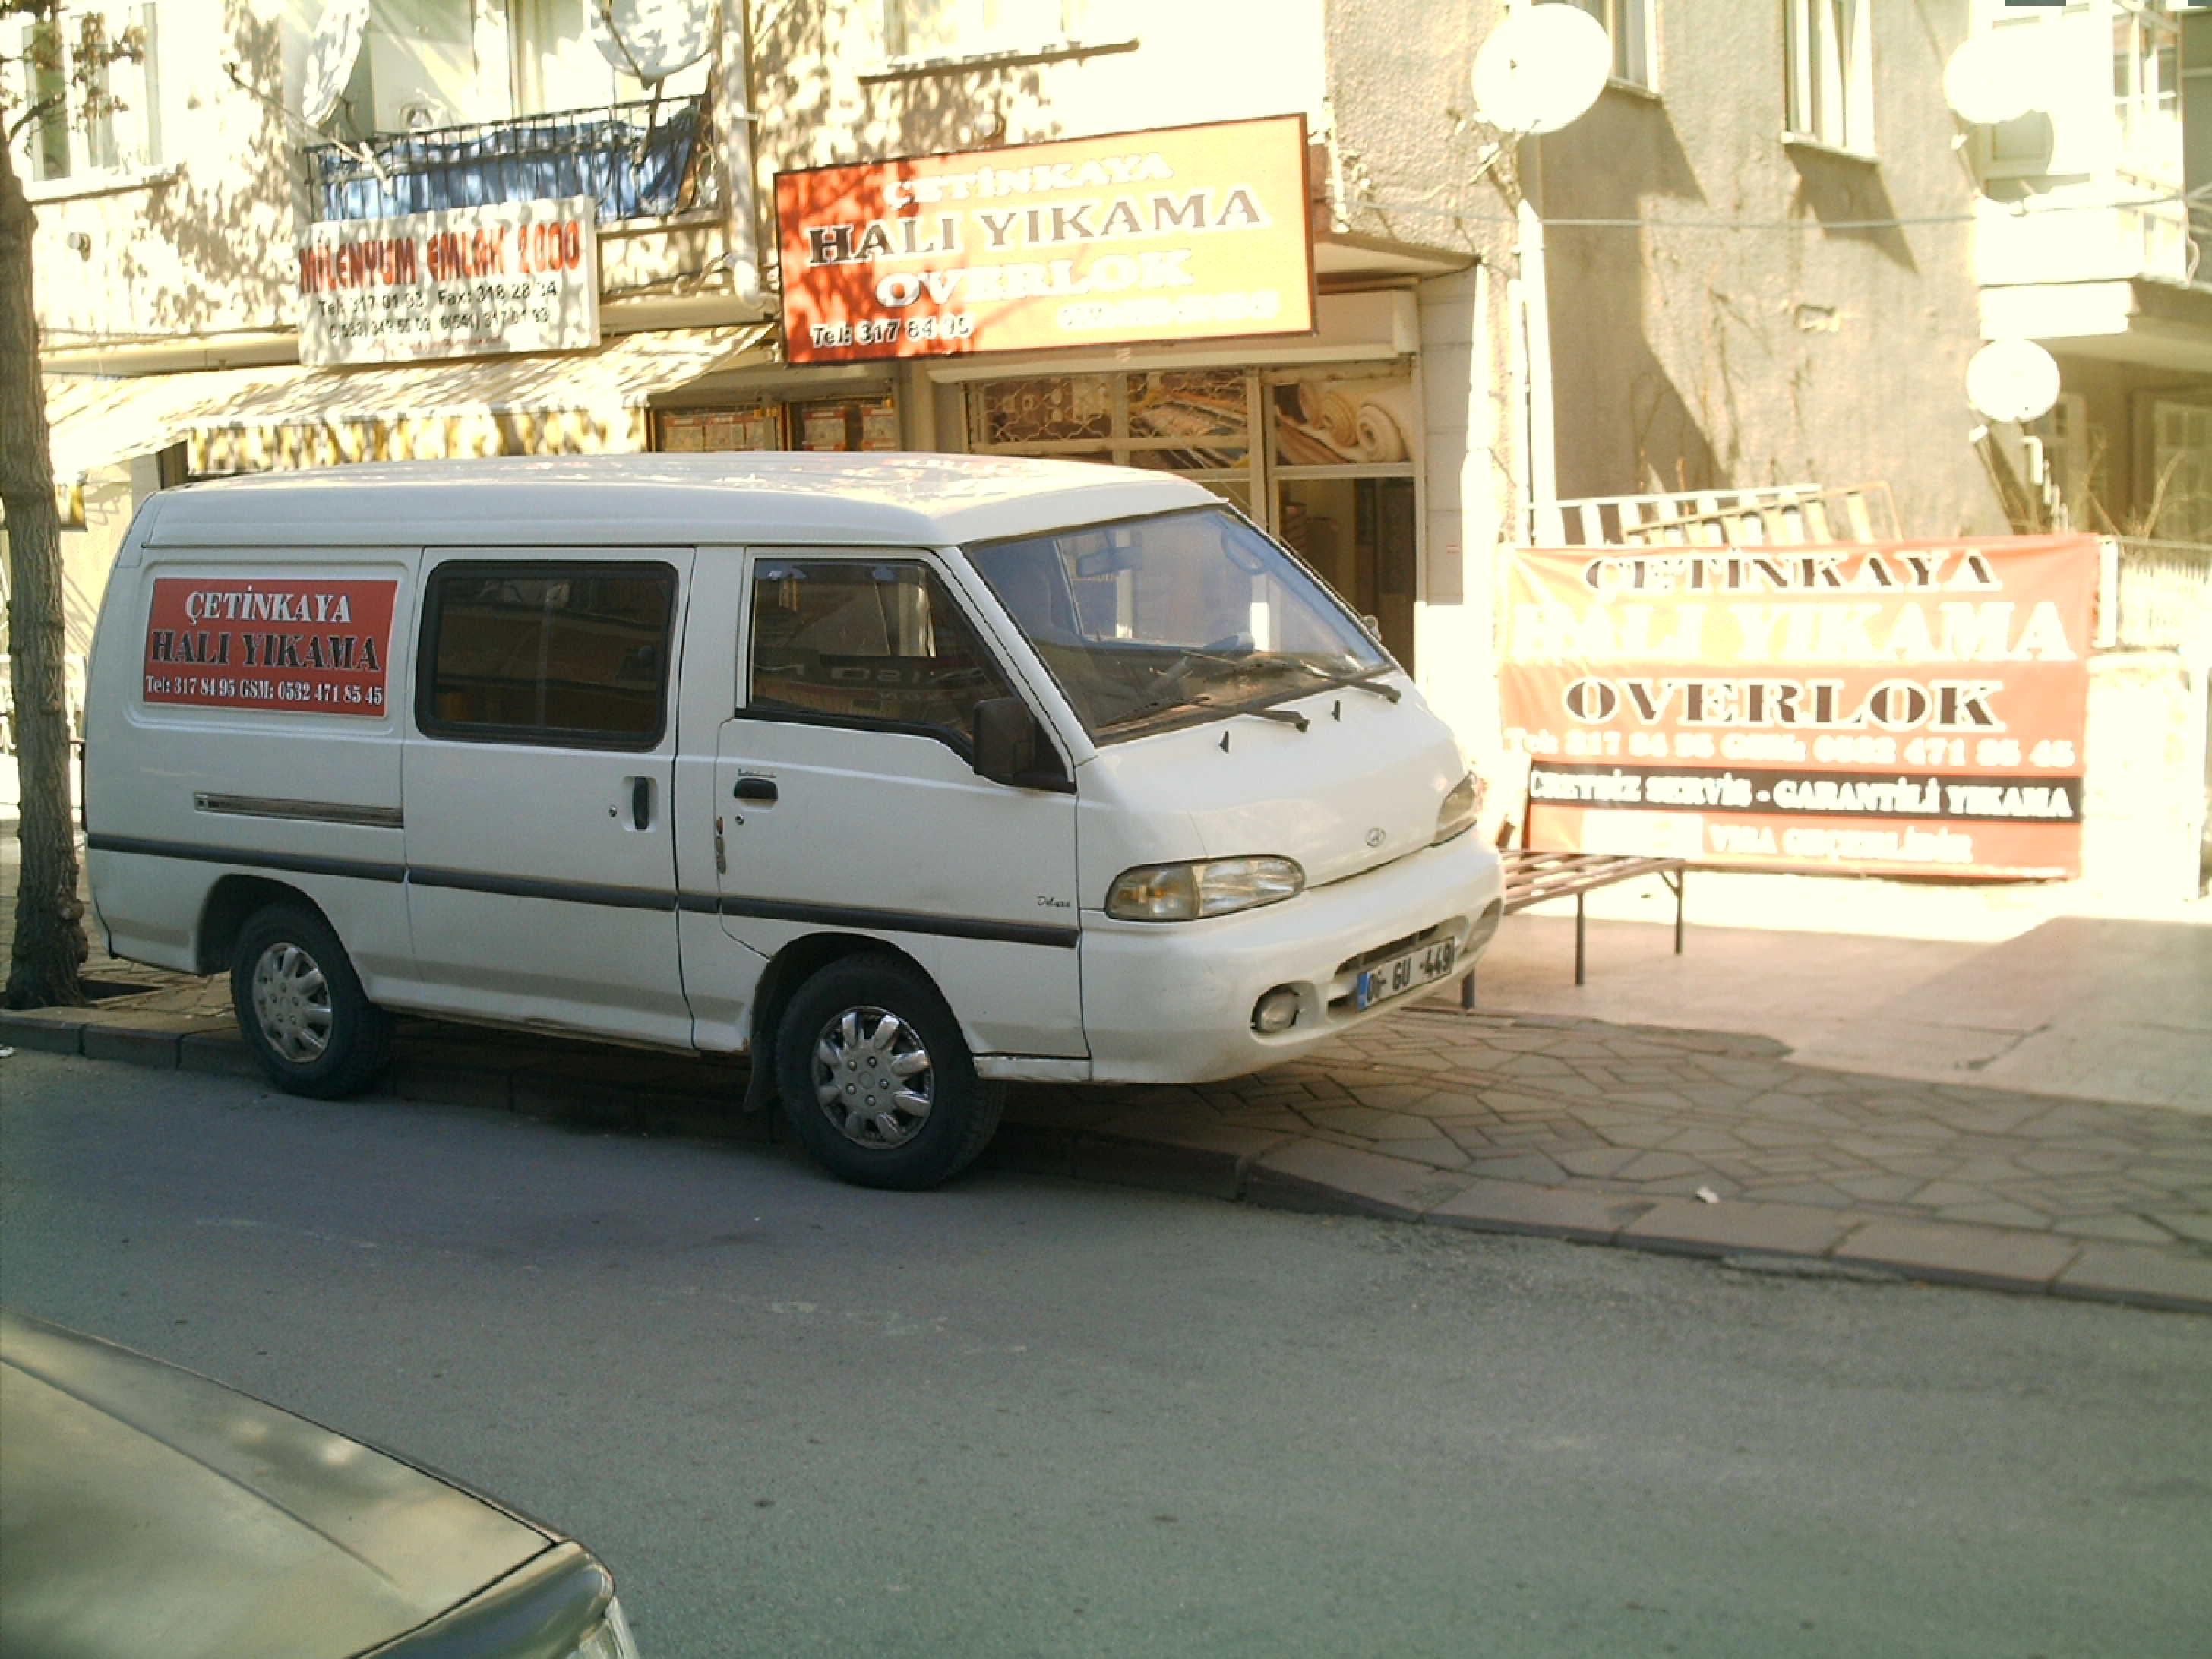 tunahan_hali_yikama_servis